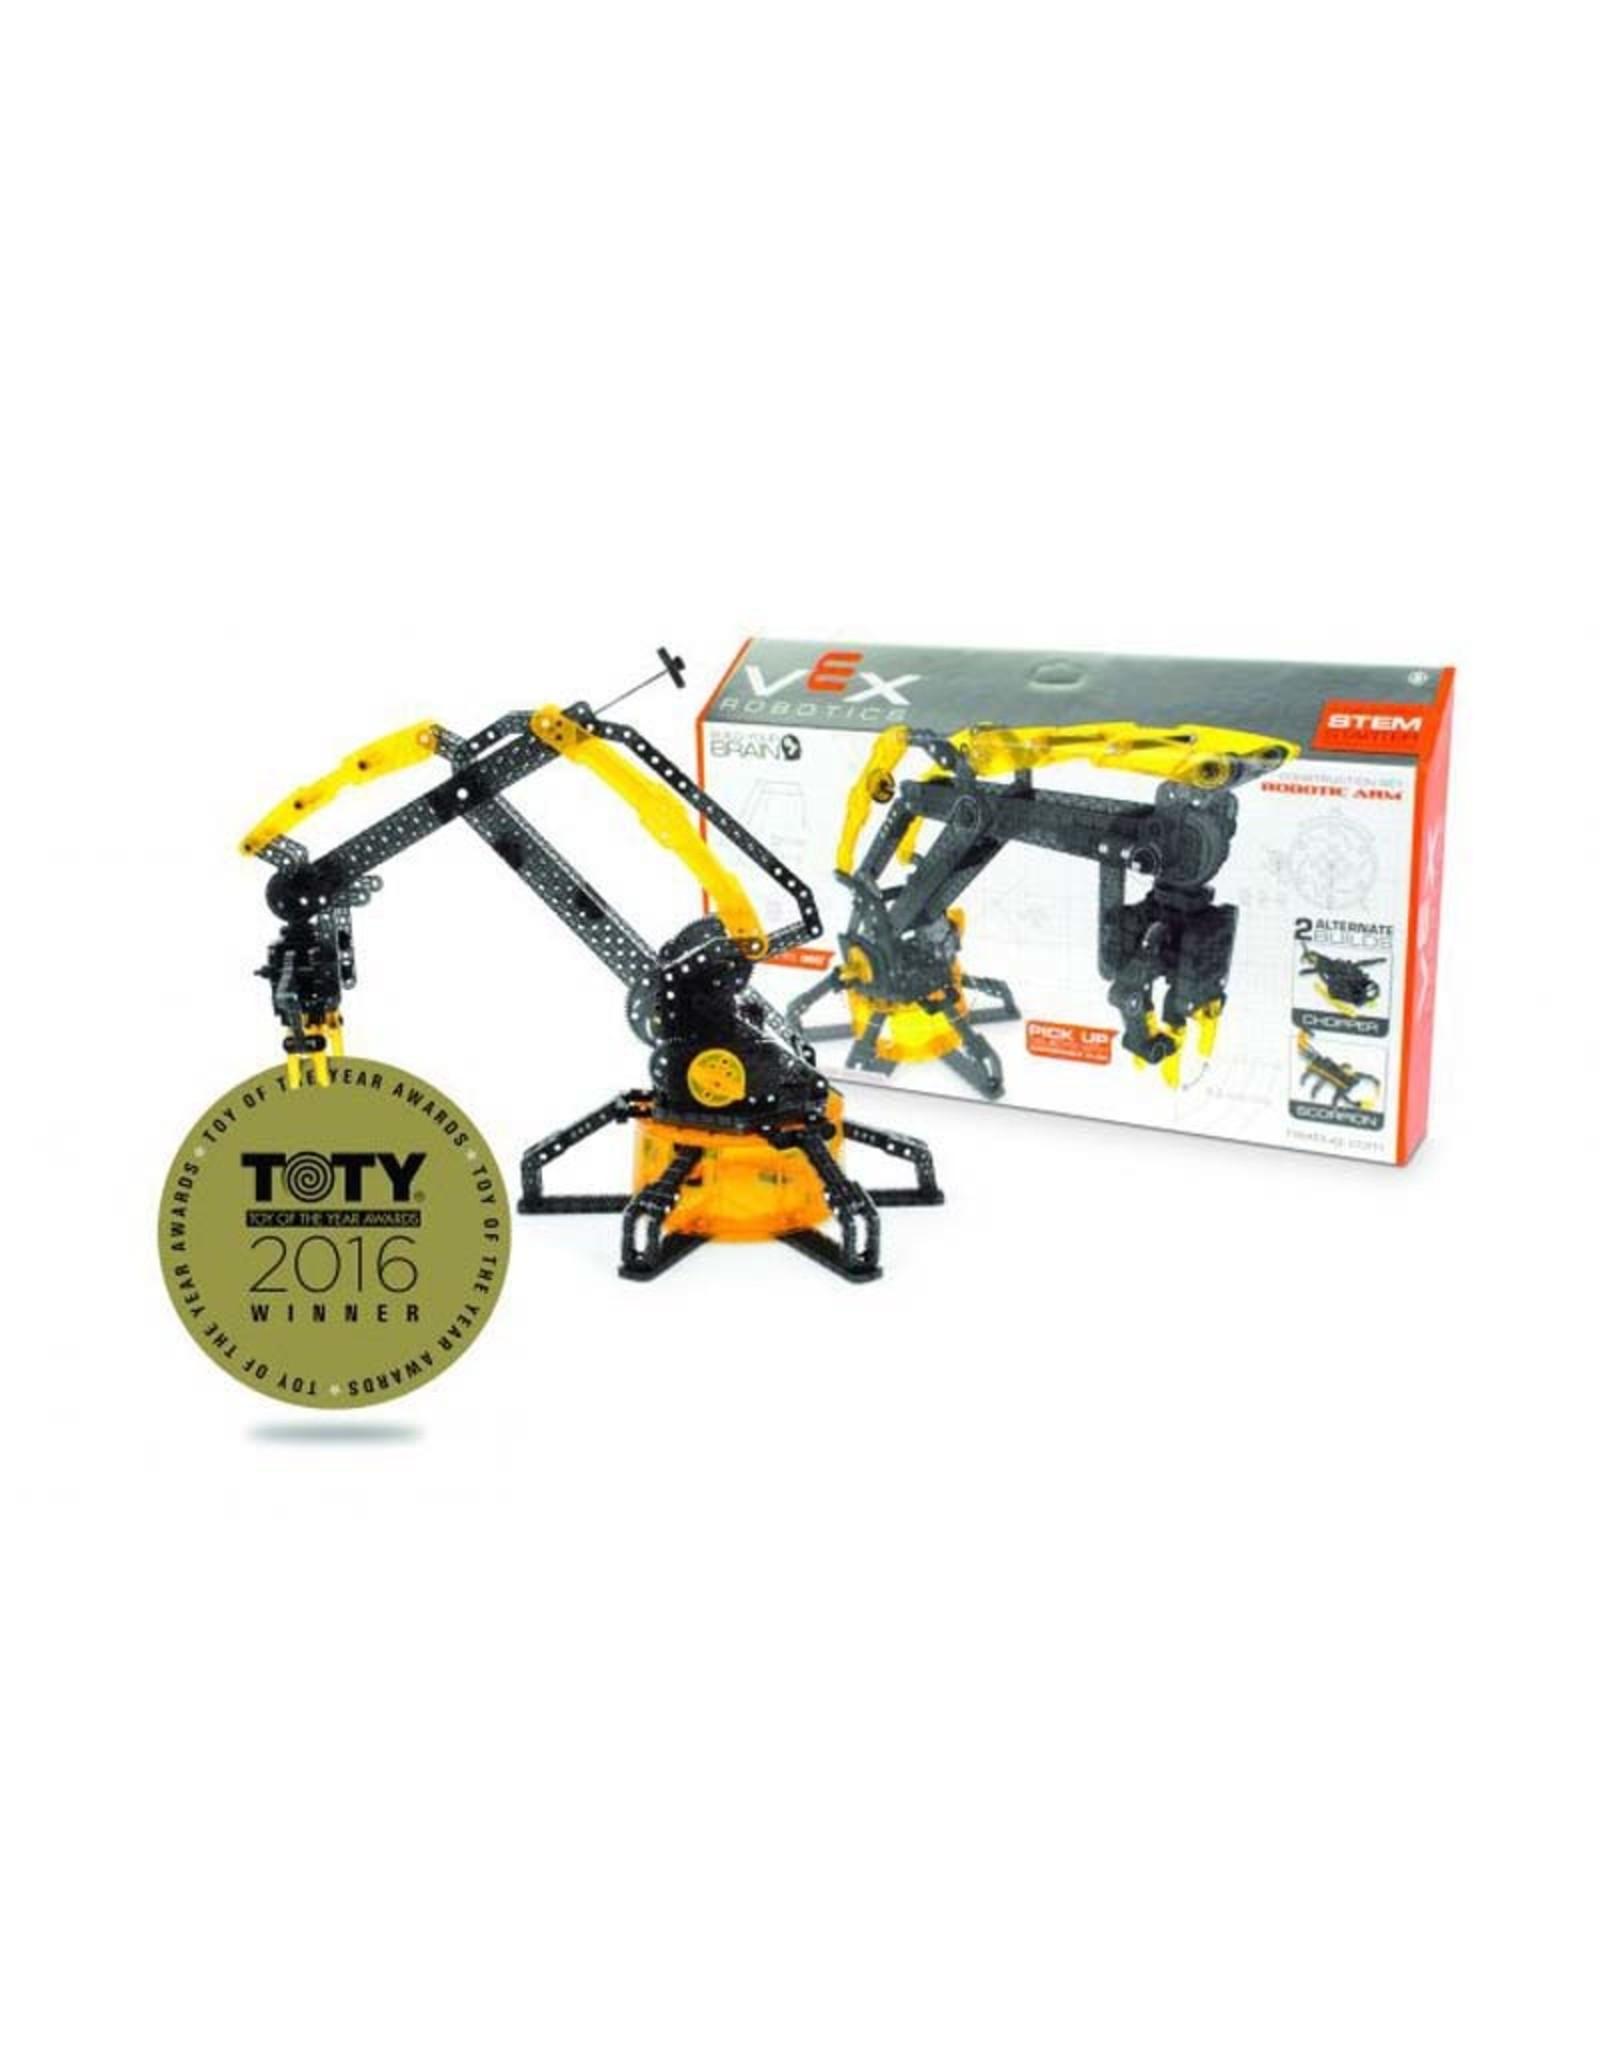 Vex Robotic Arm Kit